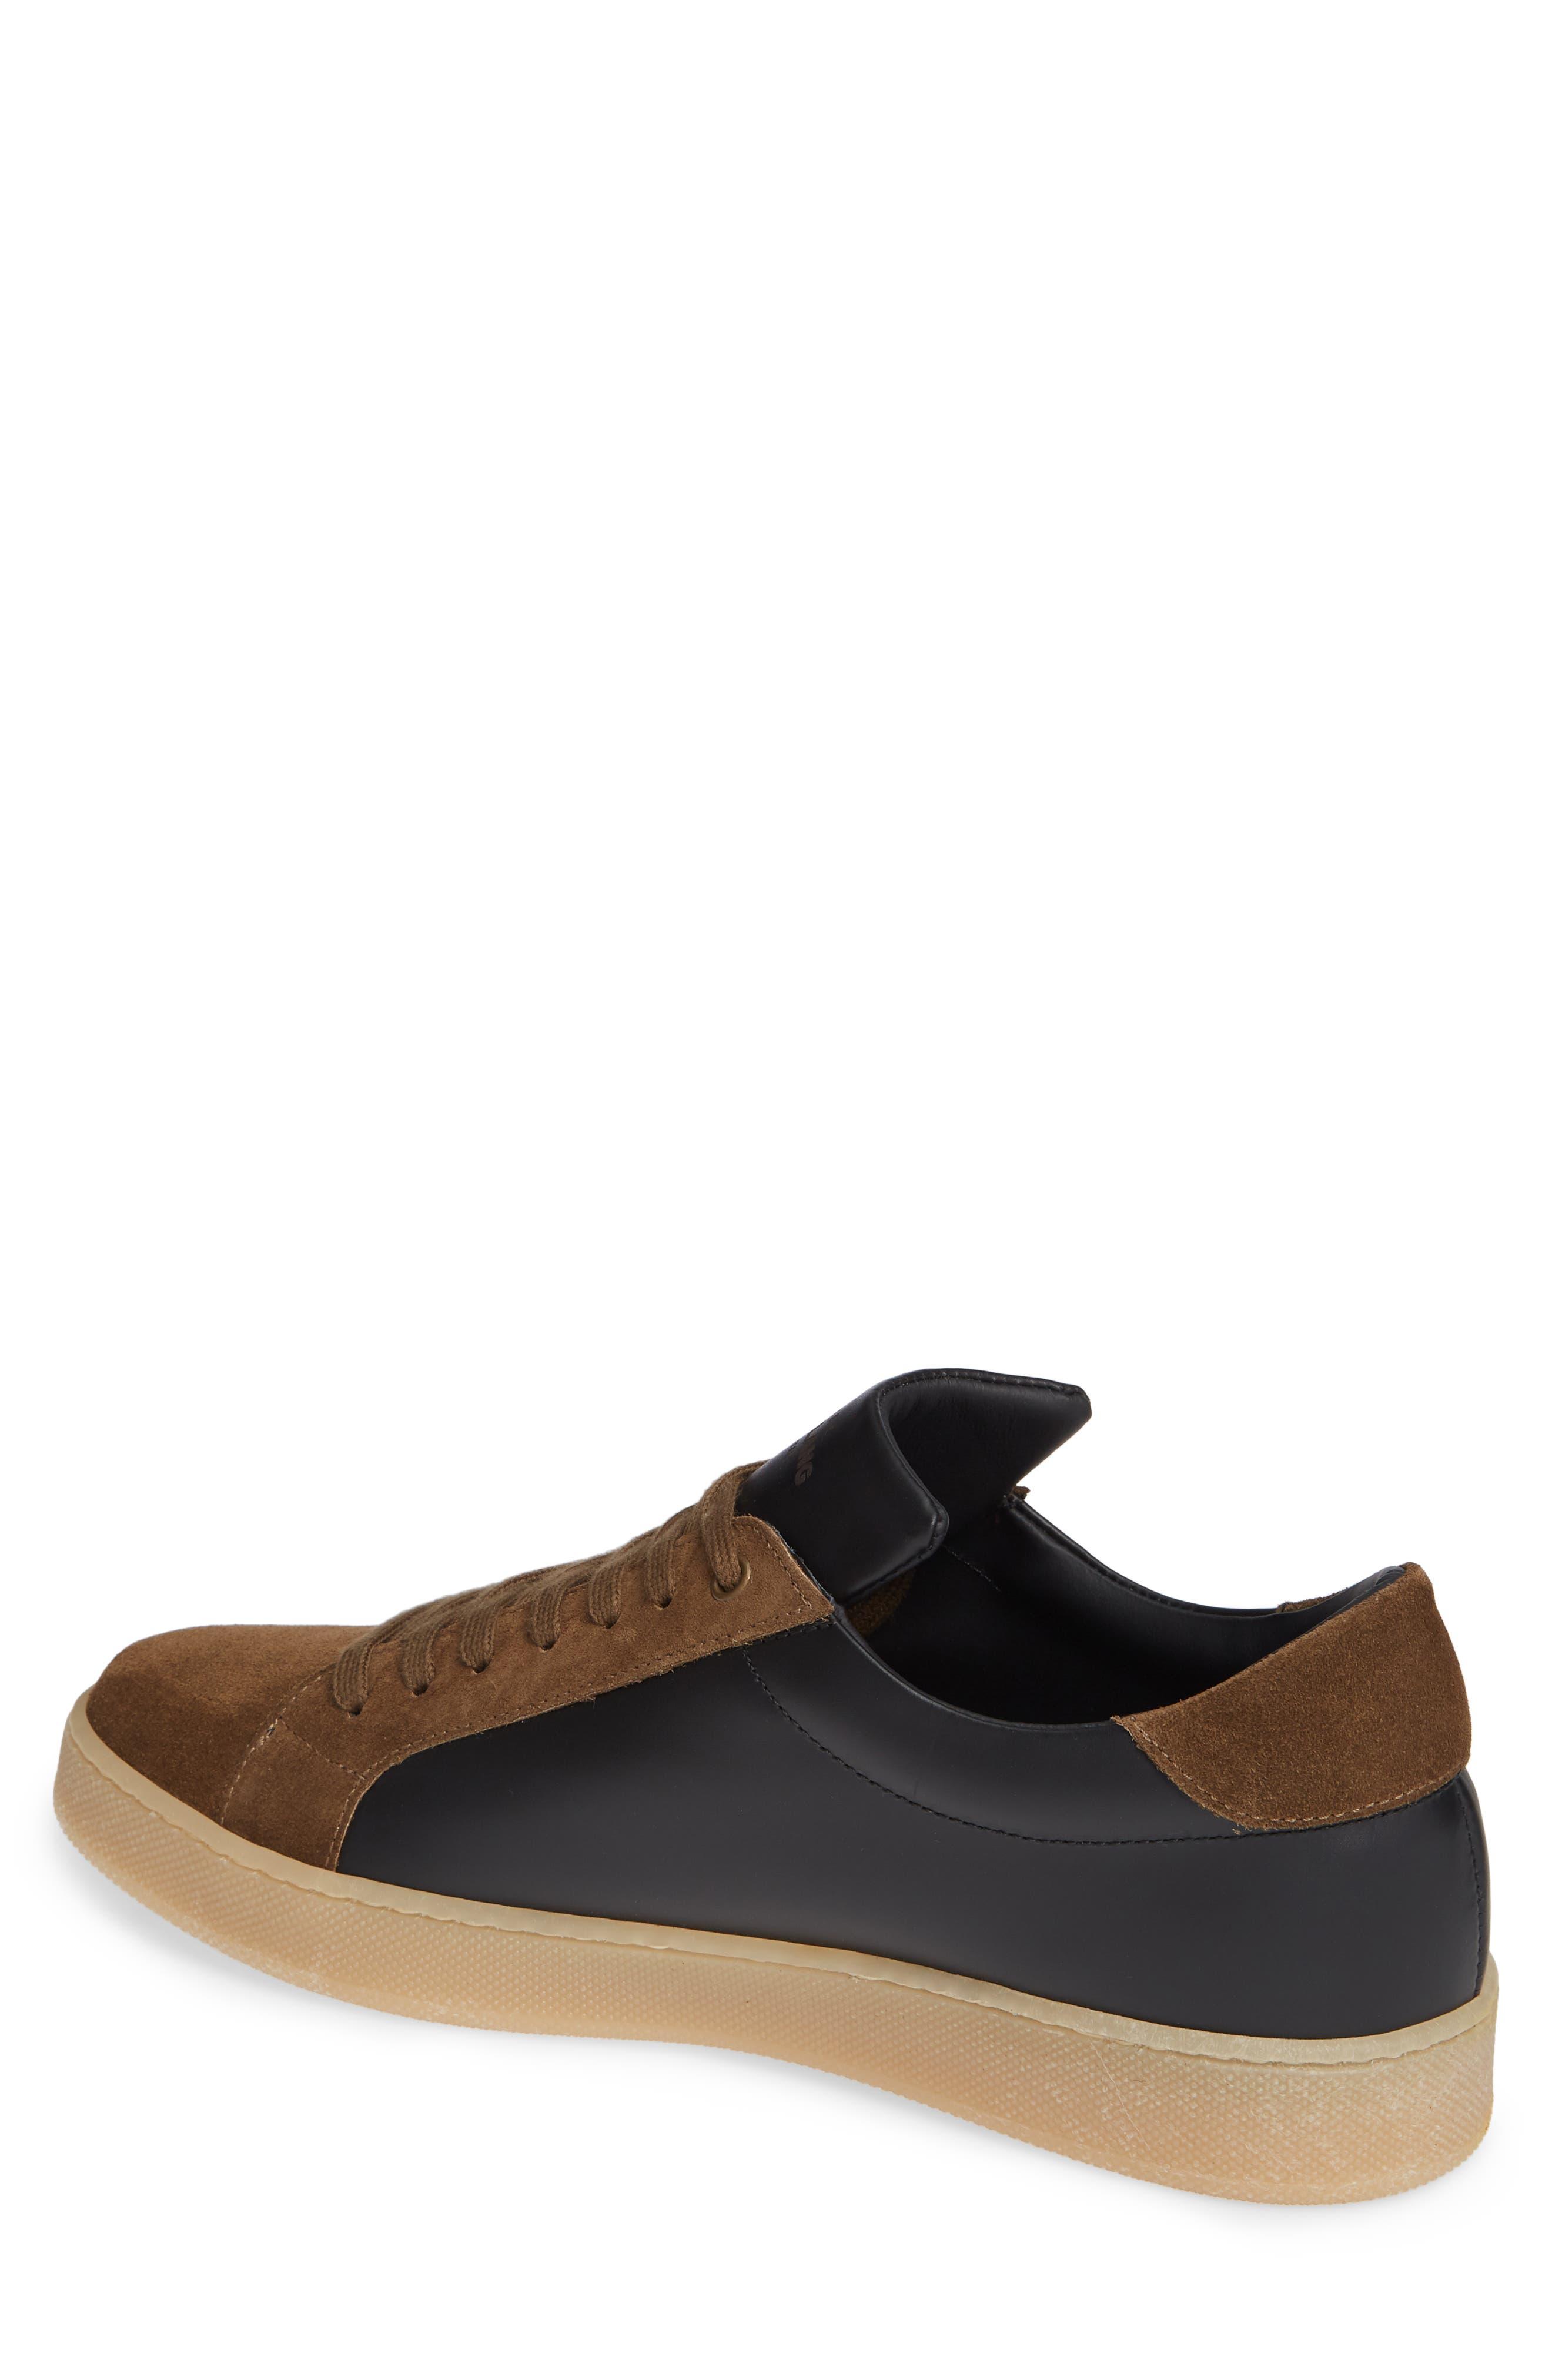 Rome Sneaker,                             Alternate thumbnail 2, color,                             BLACK/ GEIGE